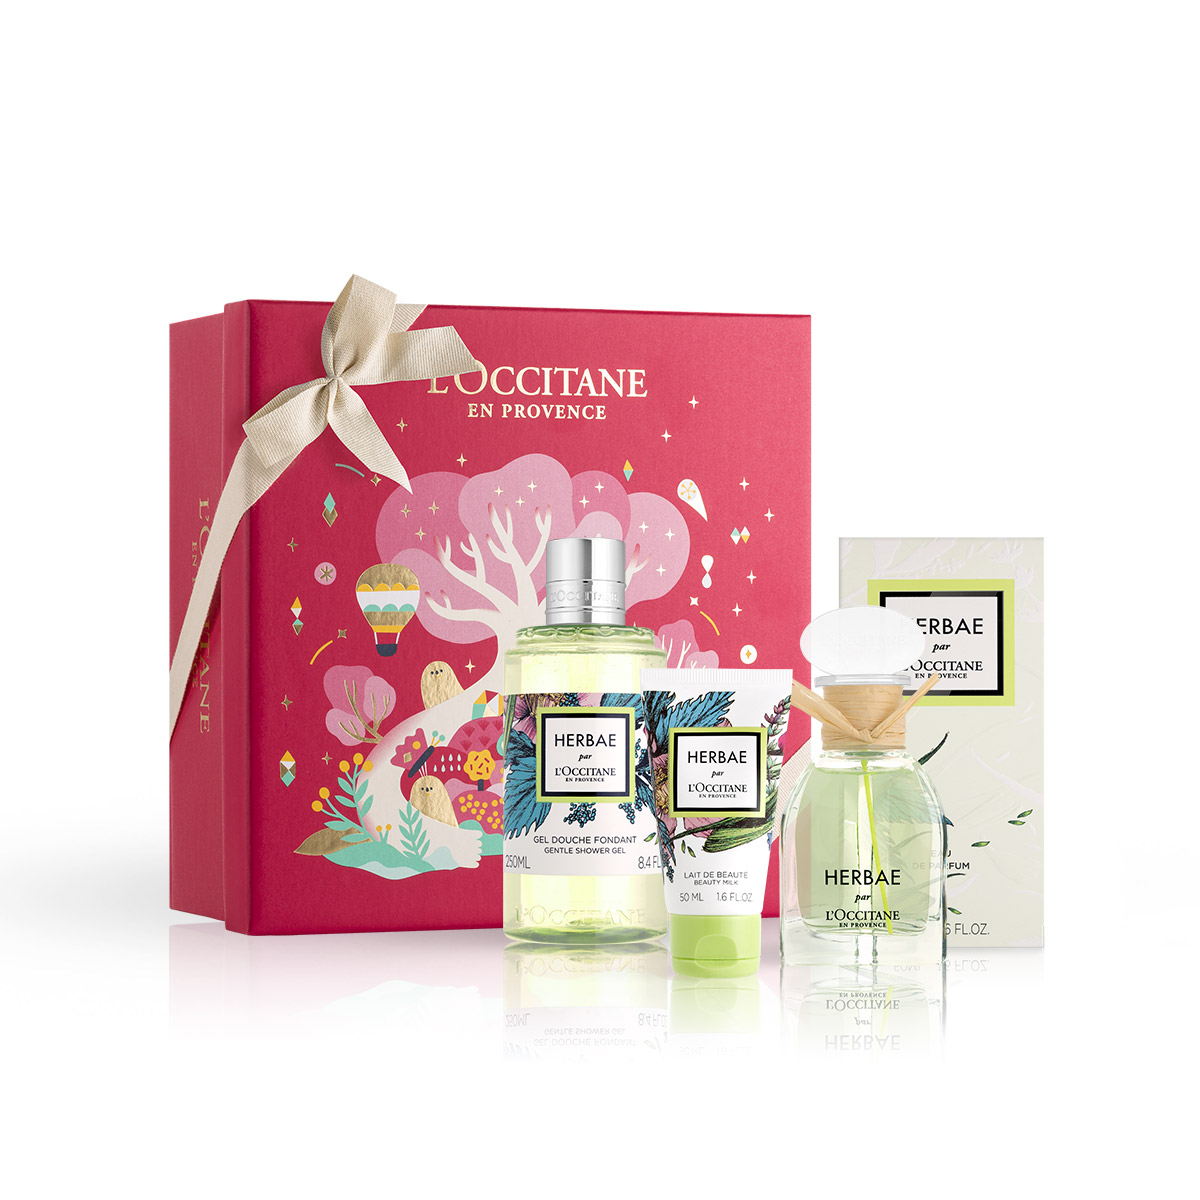 Duft-Geschenkbox Herbae par L'OCCITANE - L'Occitane en Provence